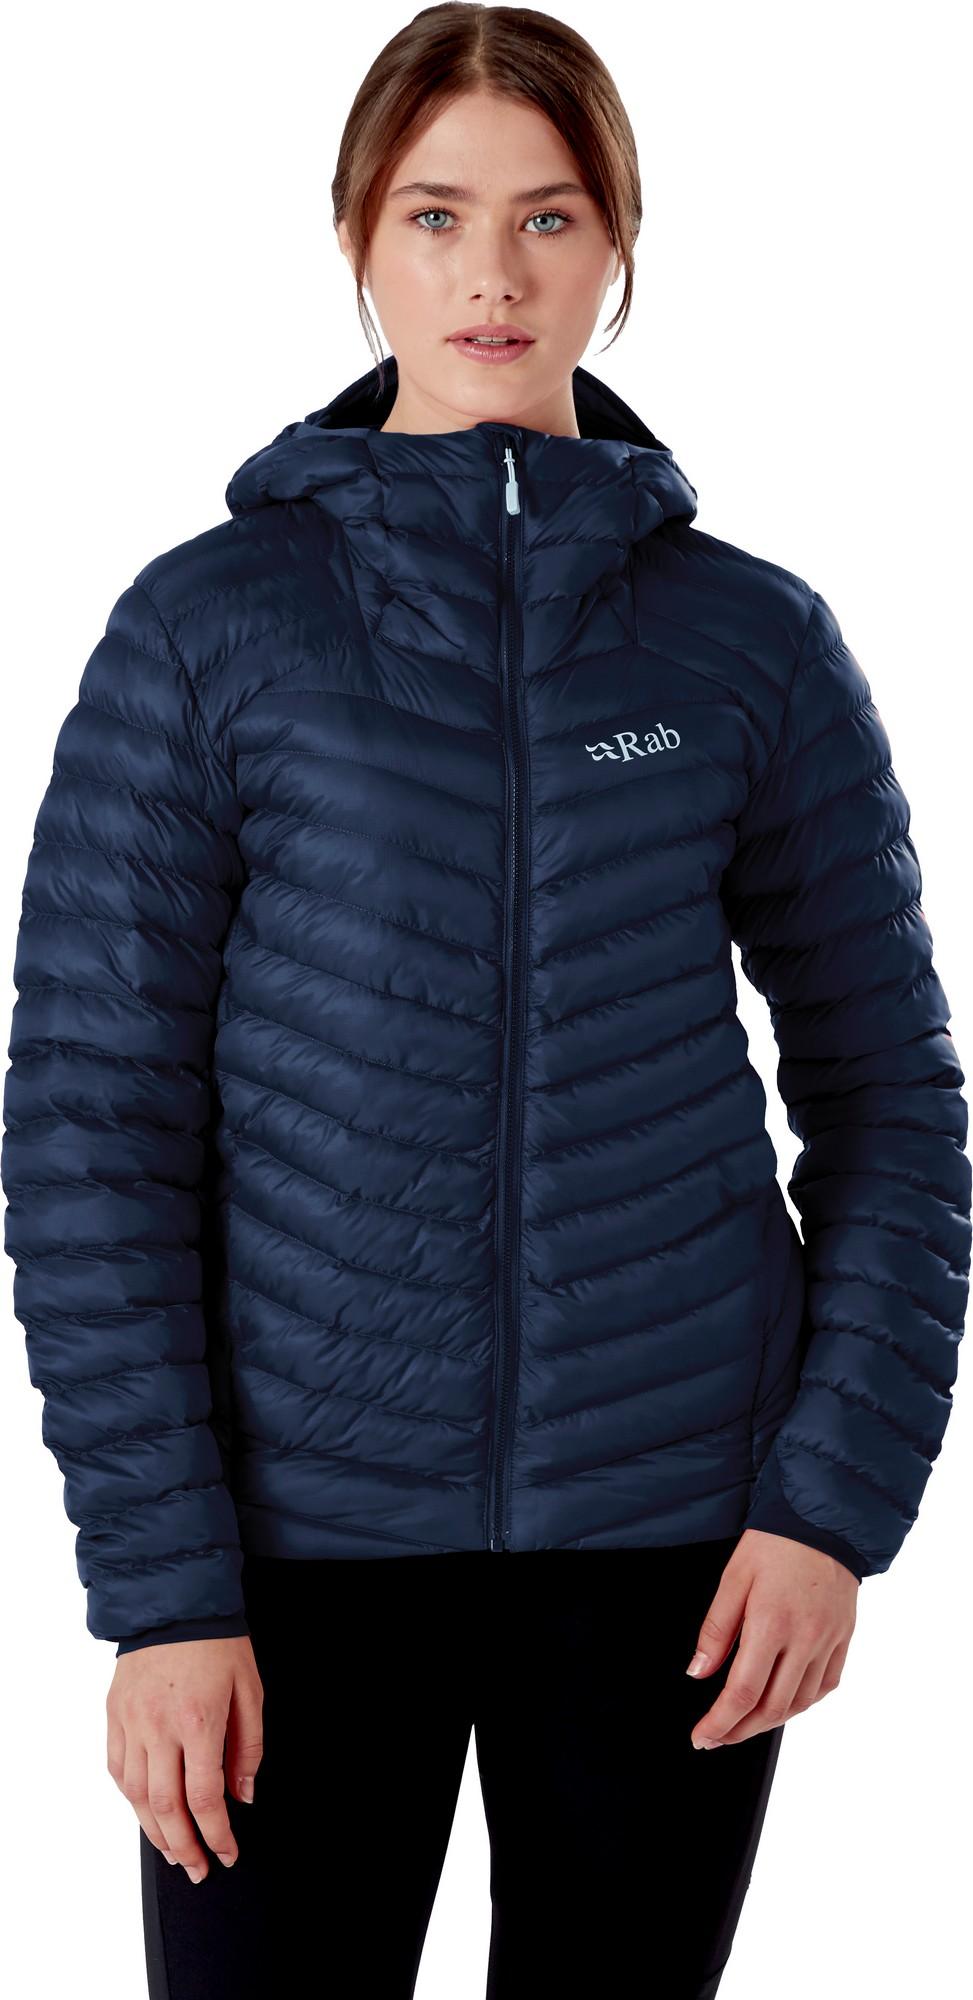 Rab Womens Cirrus Alpine Jacket Deep Ink